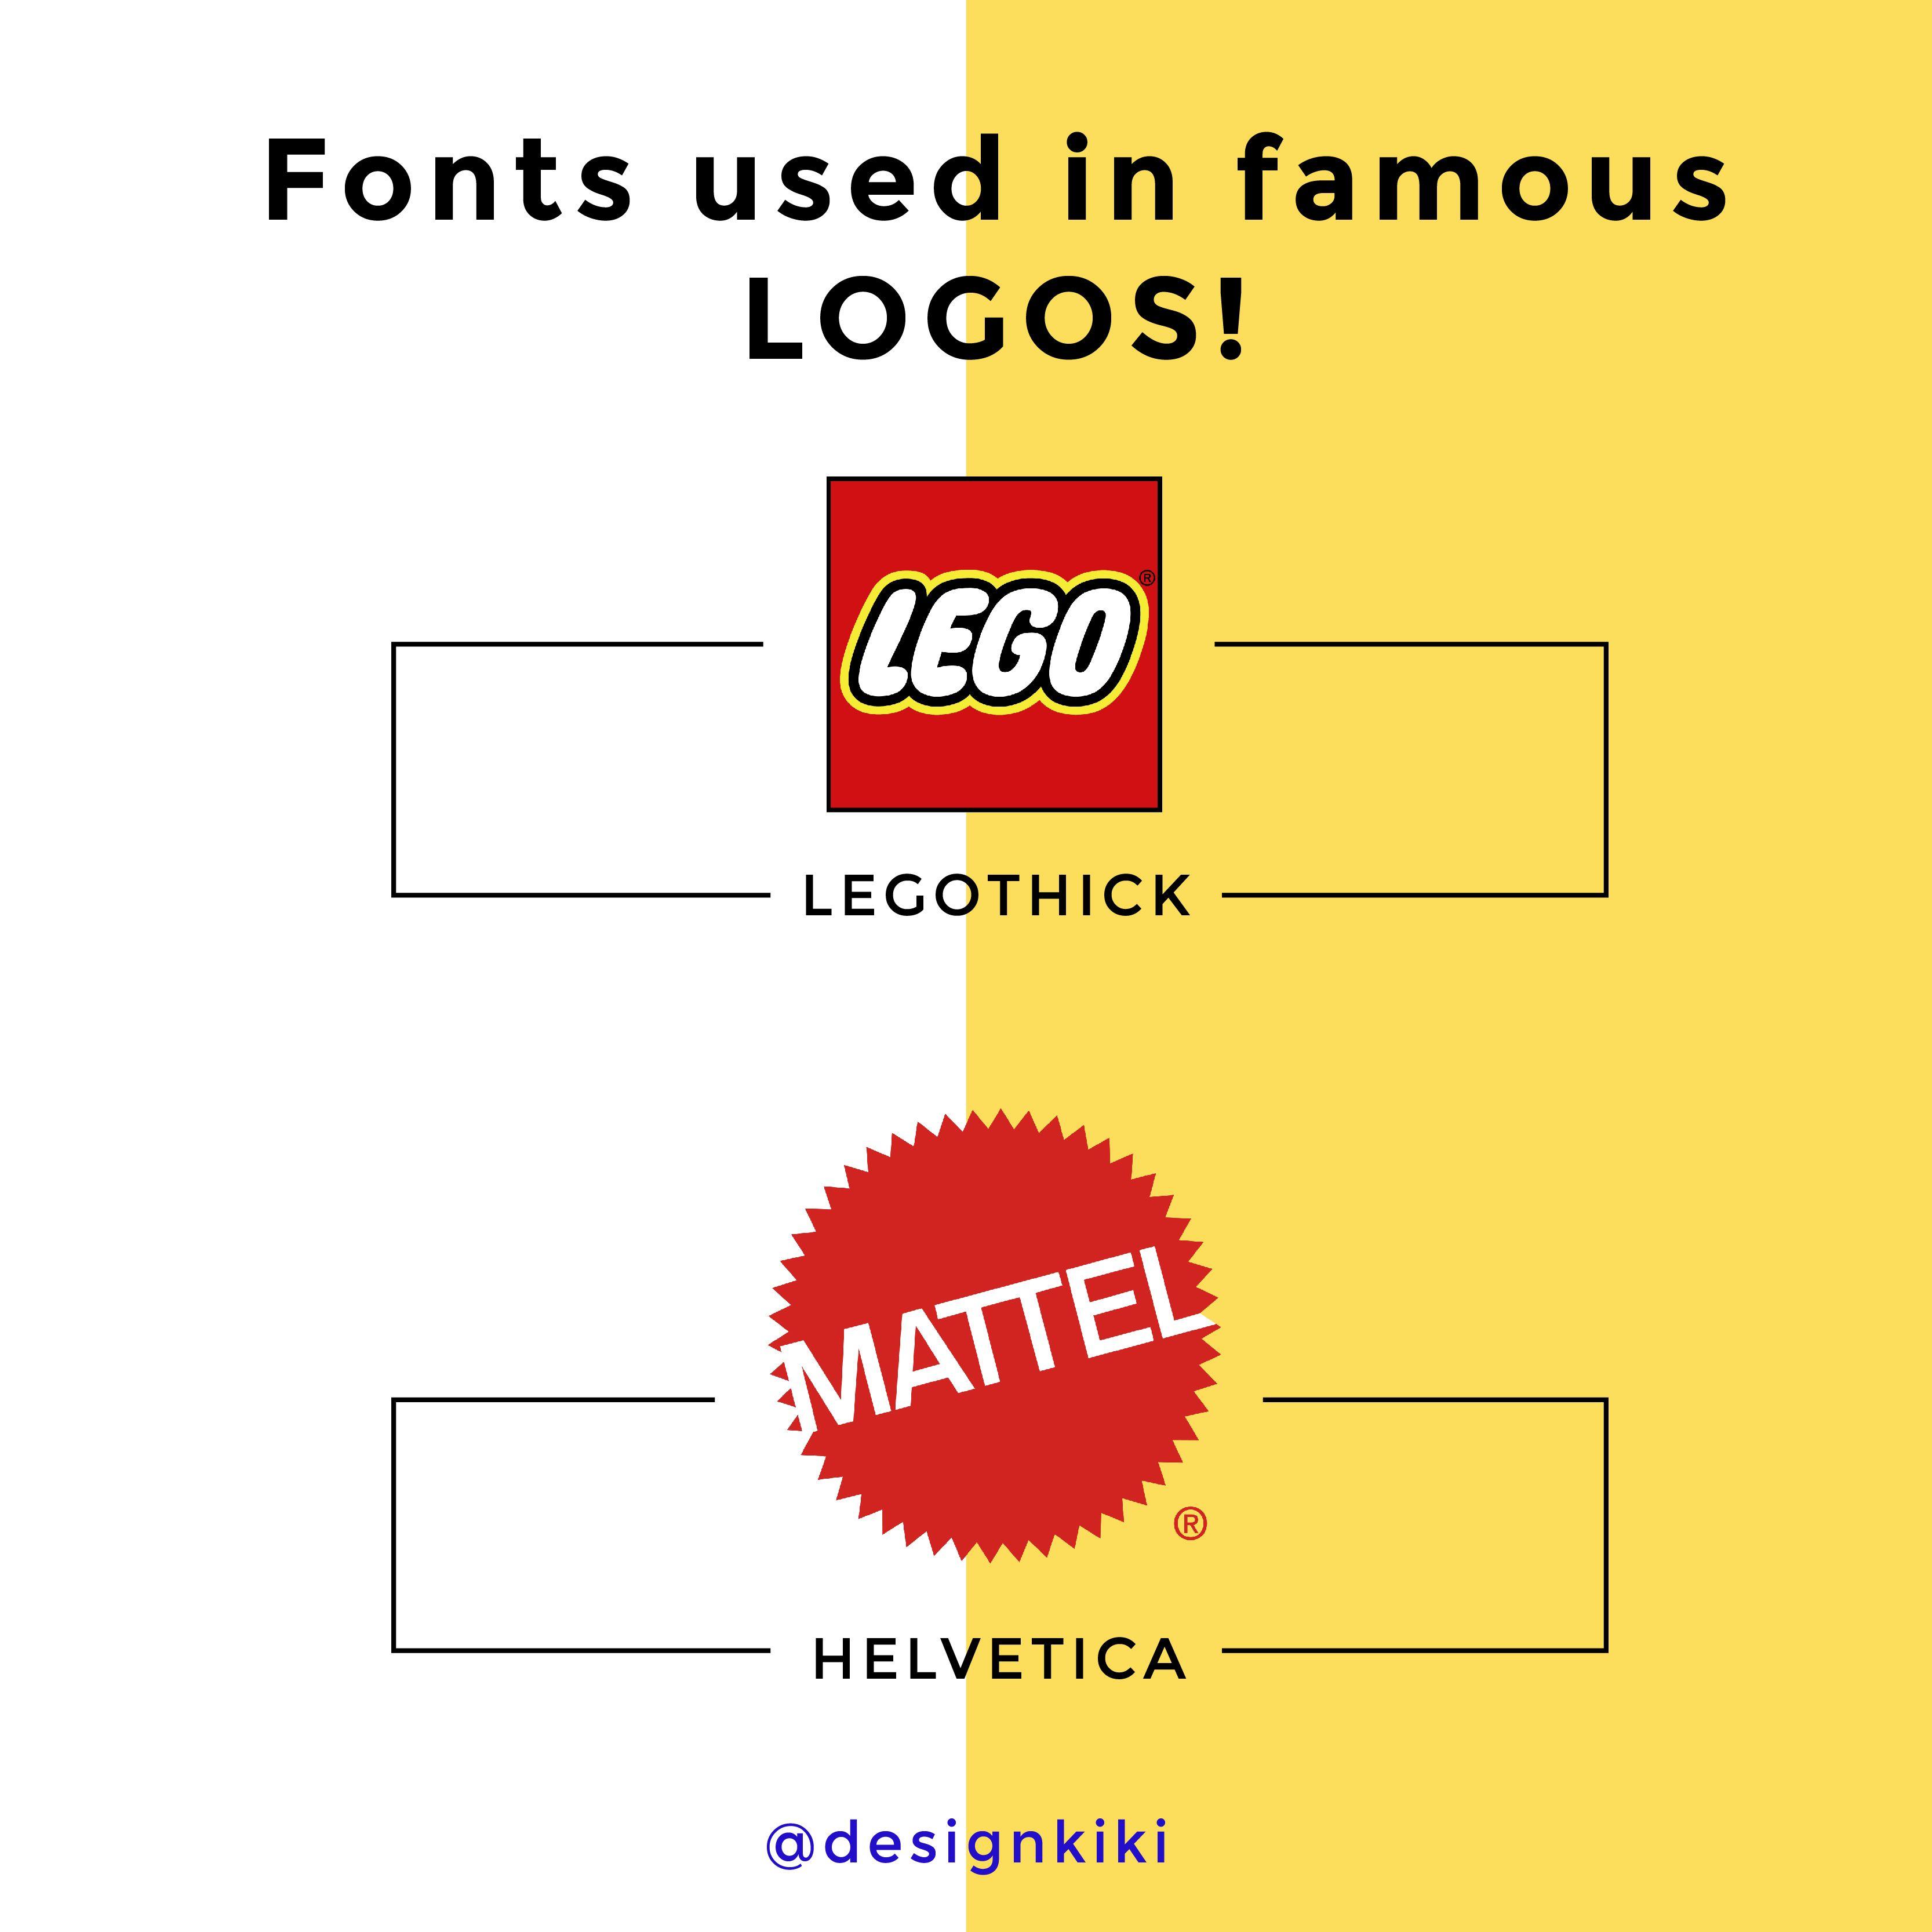 Pin by Designkiki on Fonts in 2020 Free logo generator